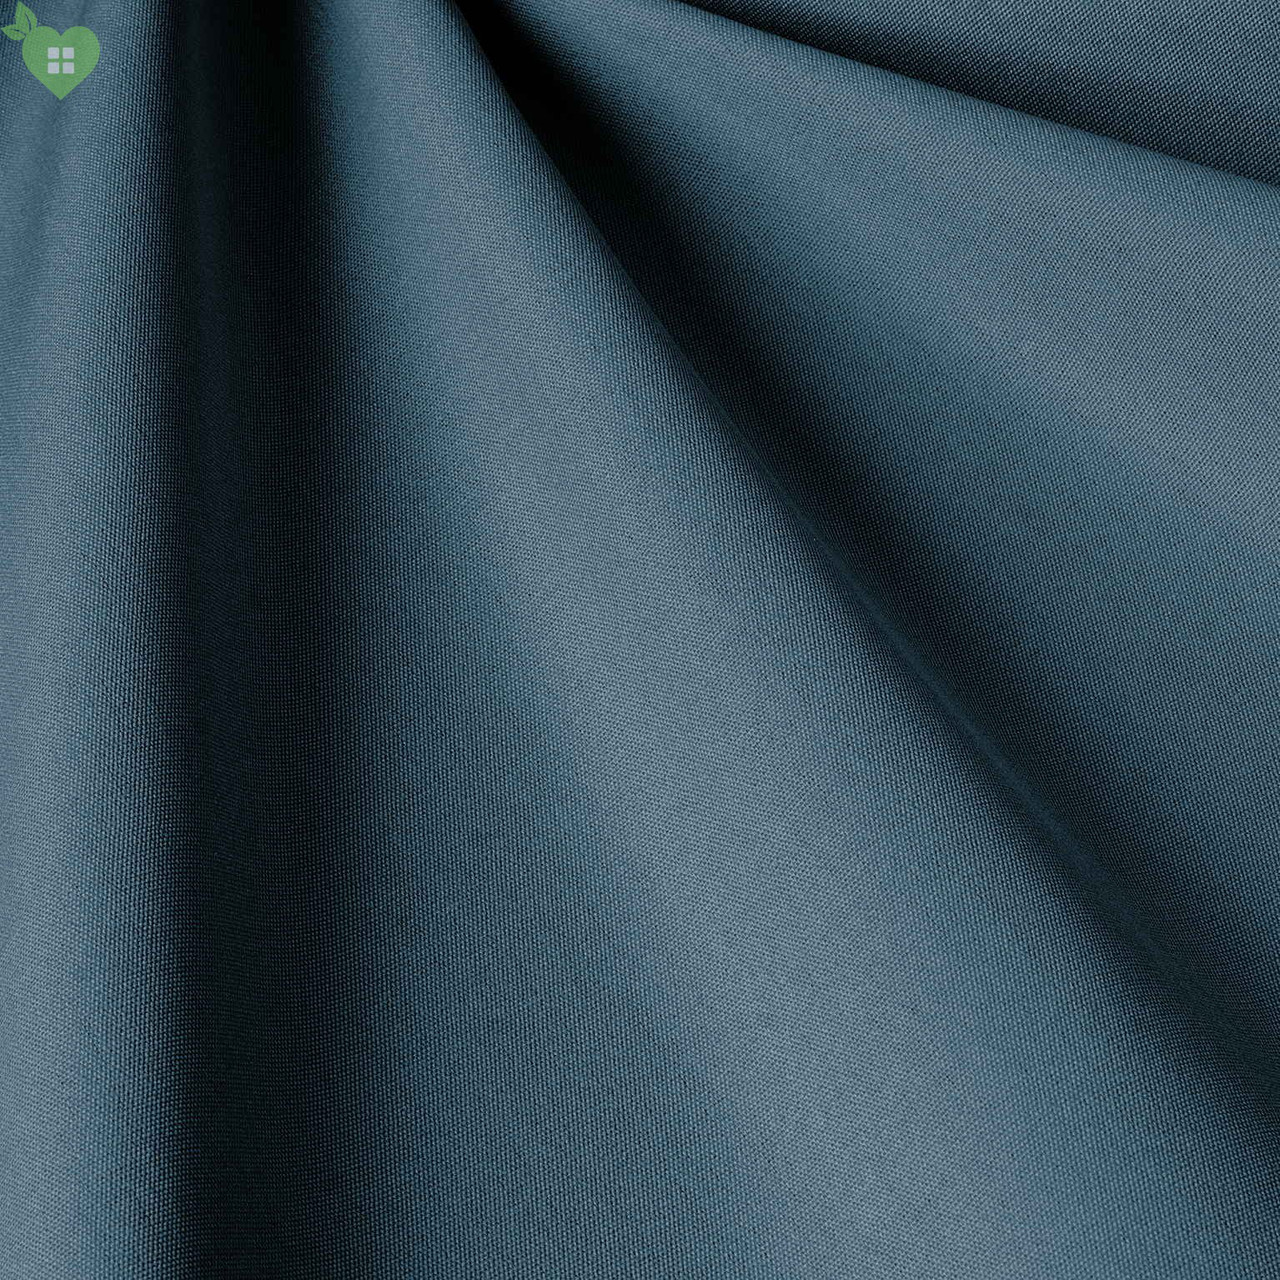 Ткань для улицы: Дралон (Outdoor) 400333v24